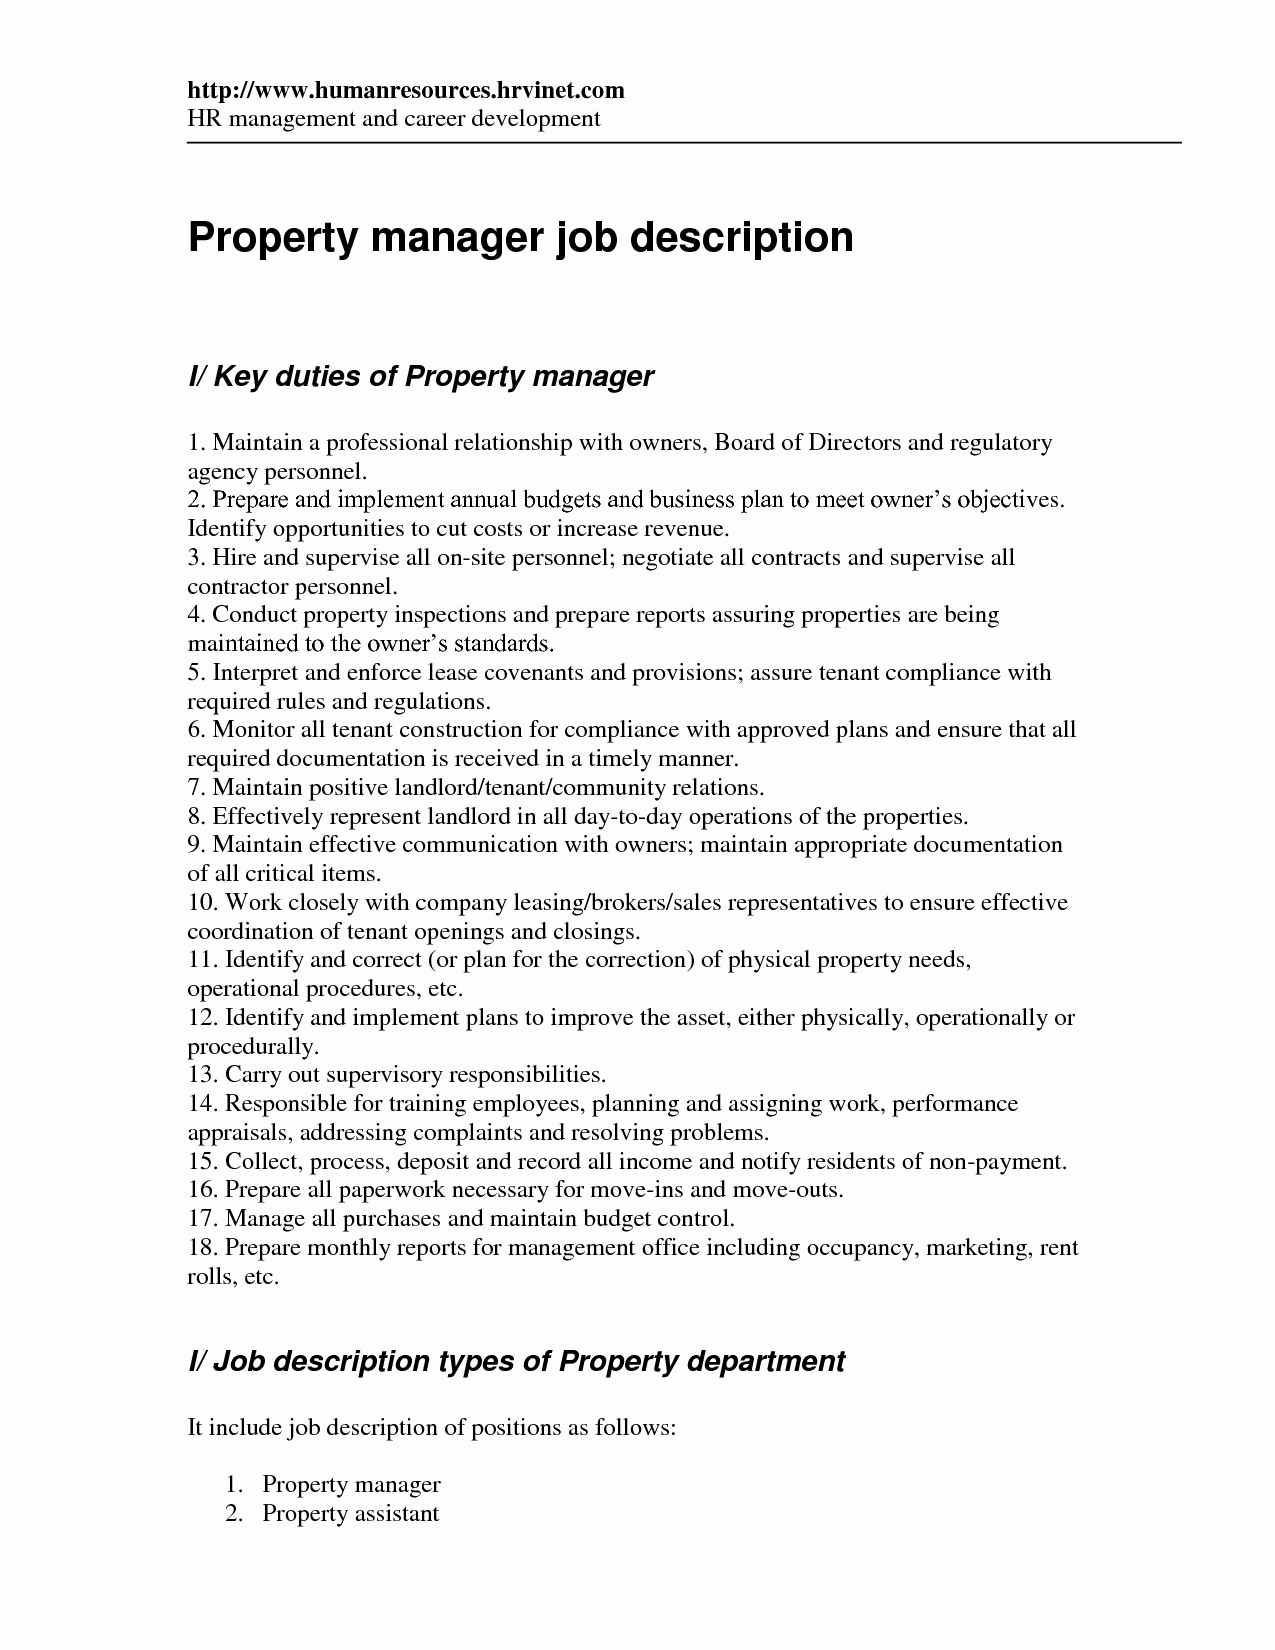 Property Manager Job Description Samples Botbuzz